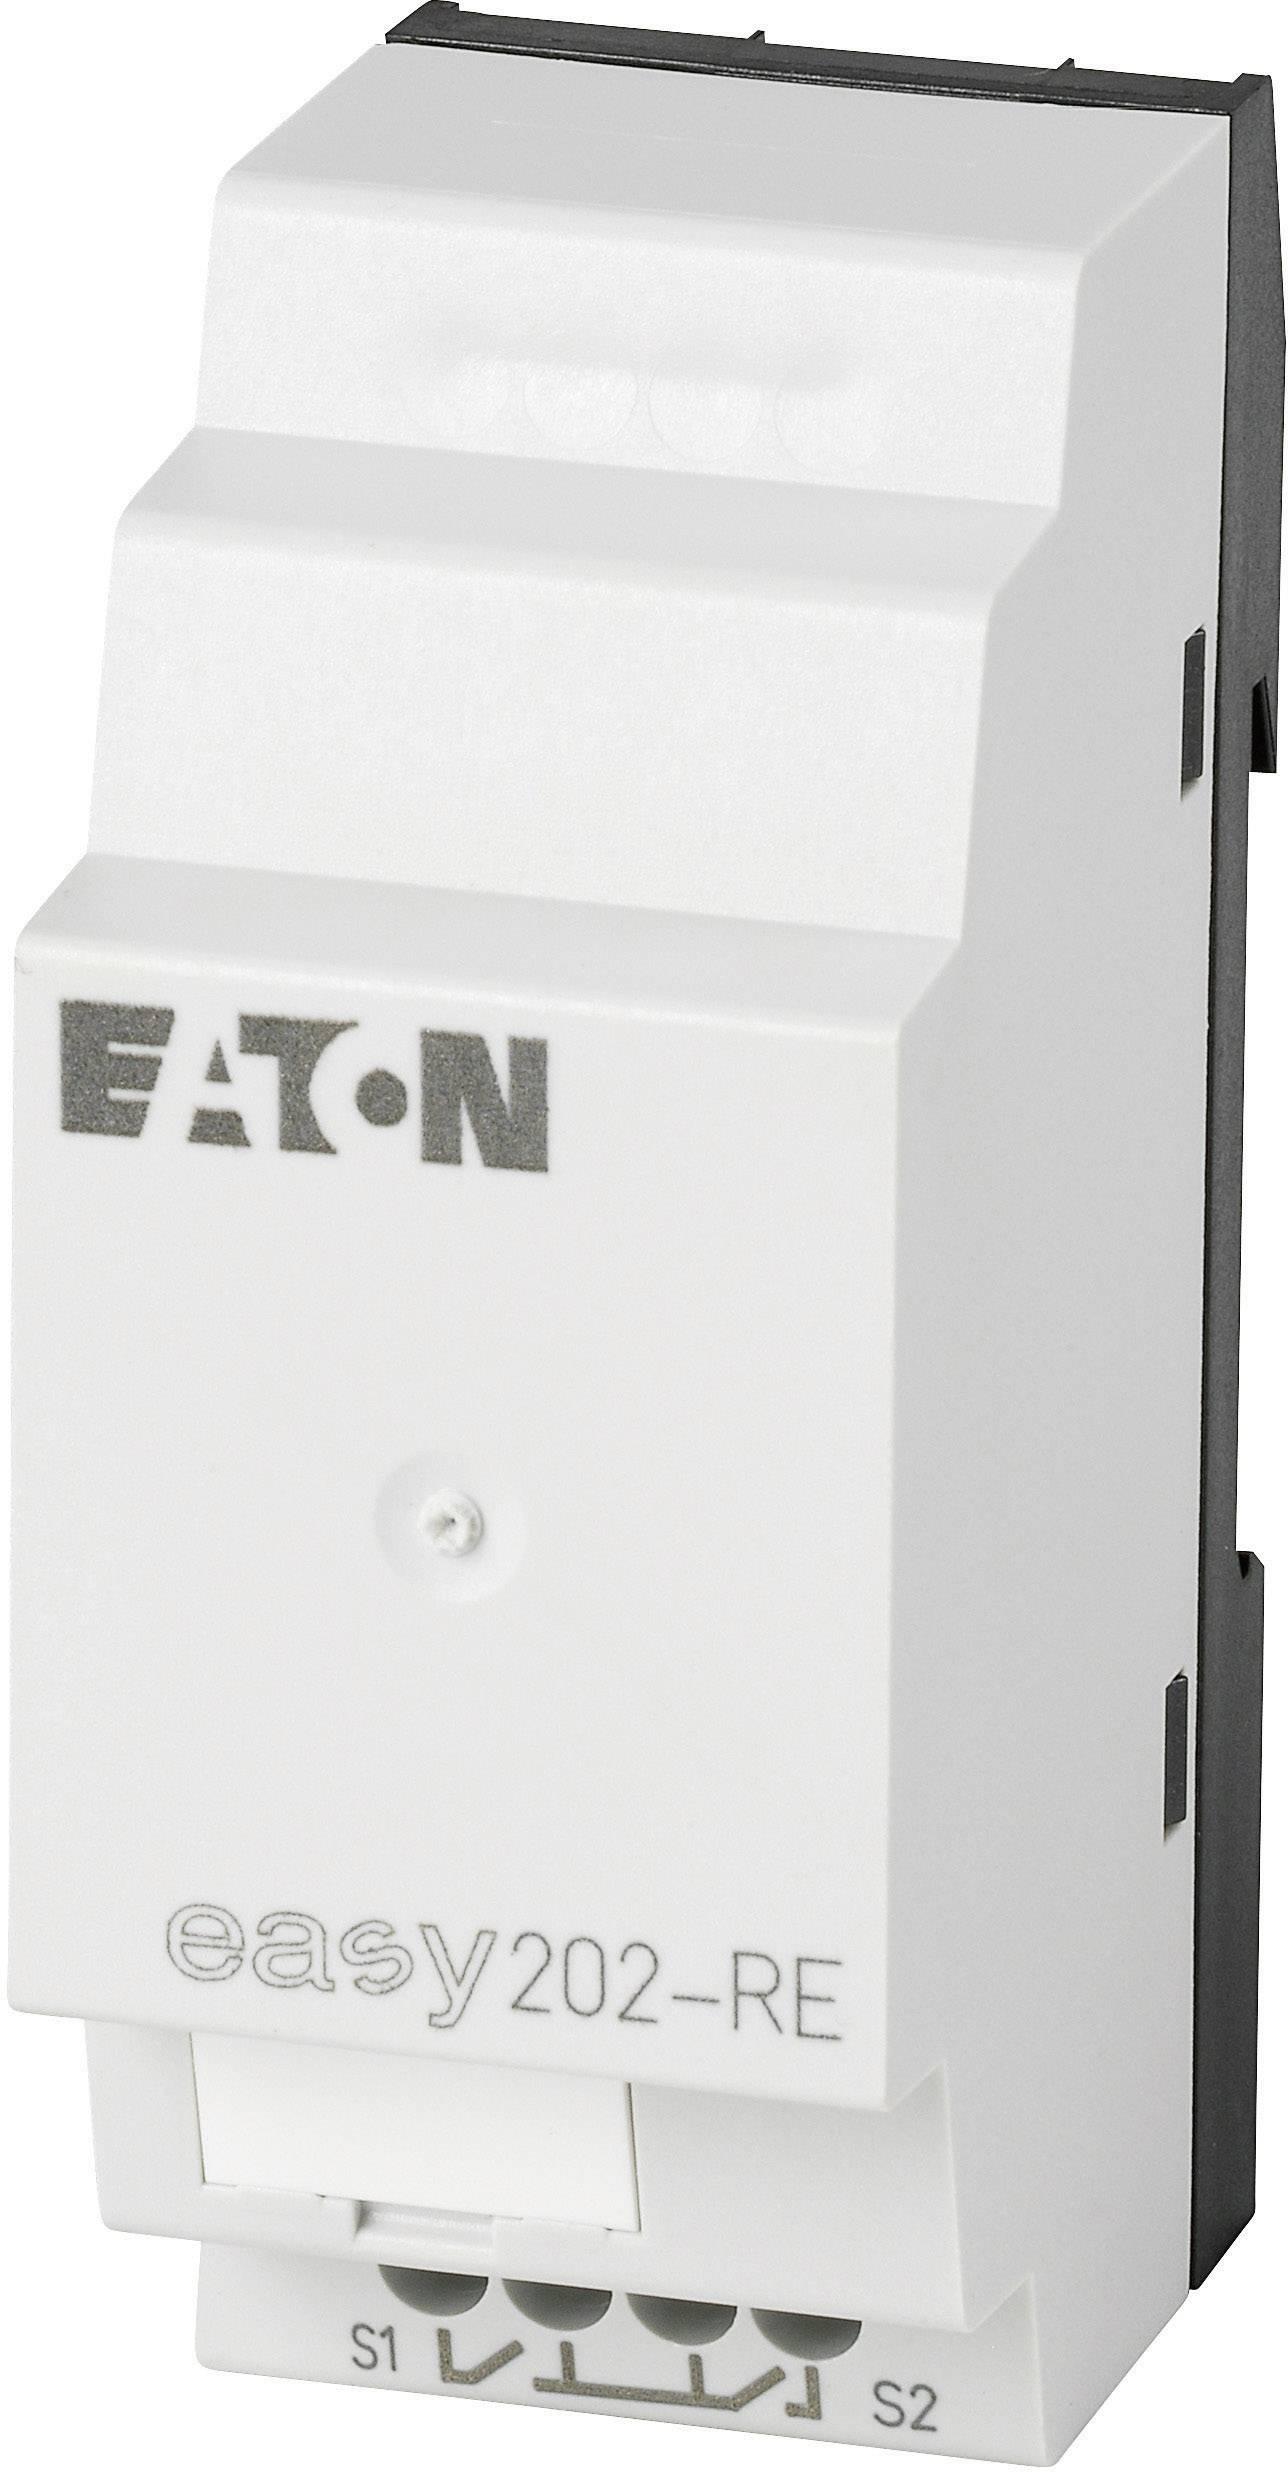 Modulové relé Eaton easy 202-RE